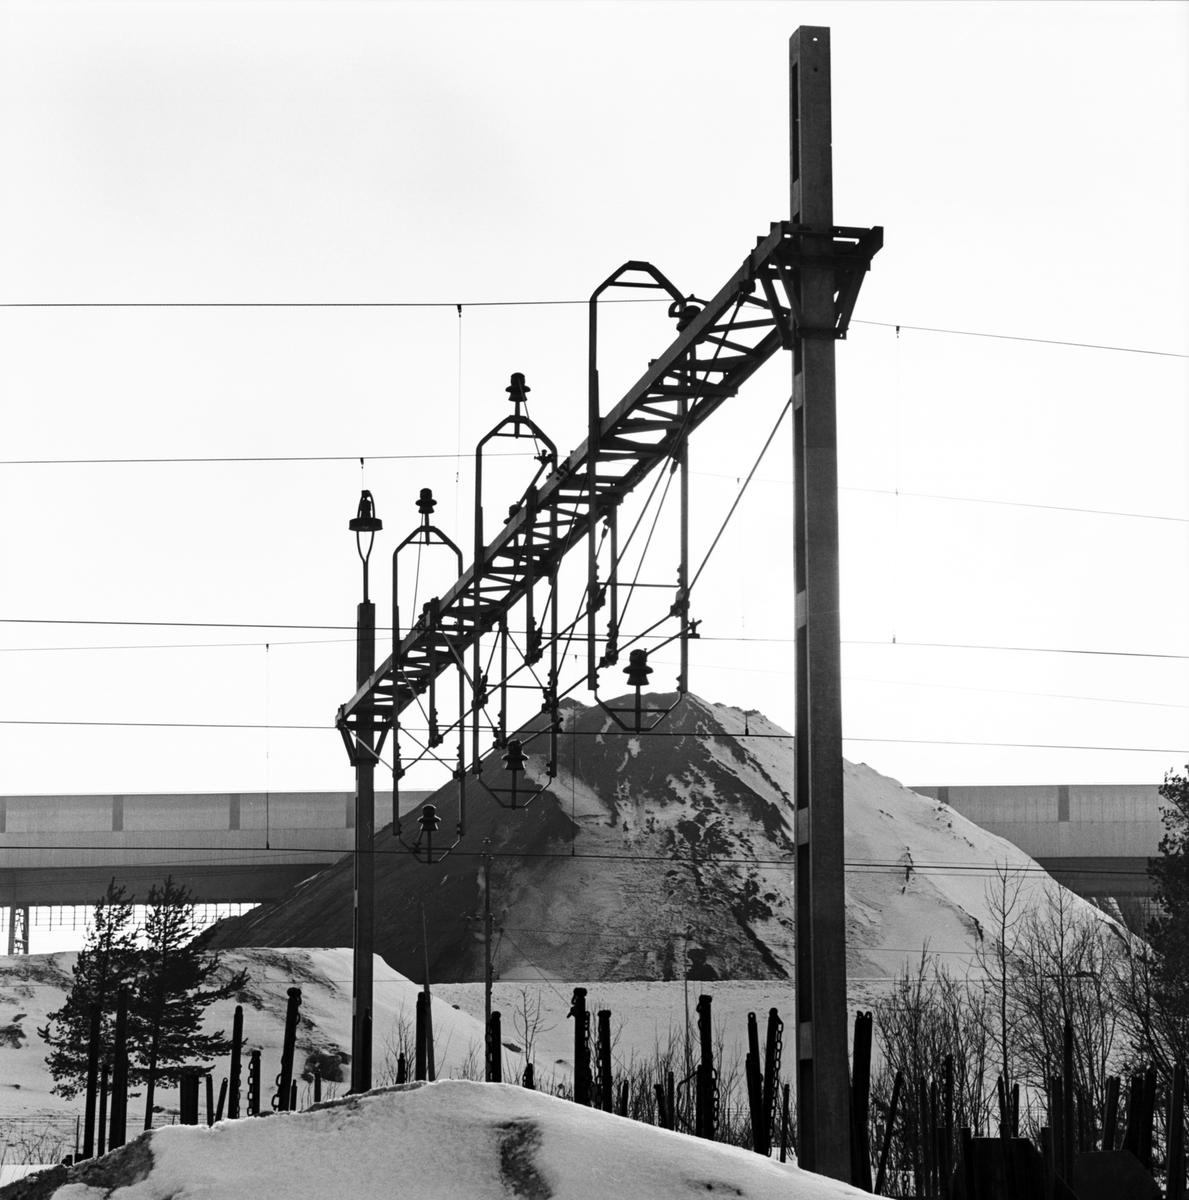 Kontaktledningsbrygga. Malmbangård, Luleå-Notviken